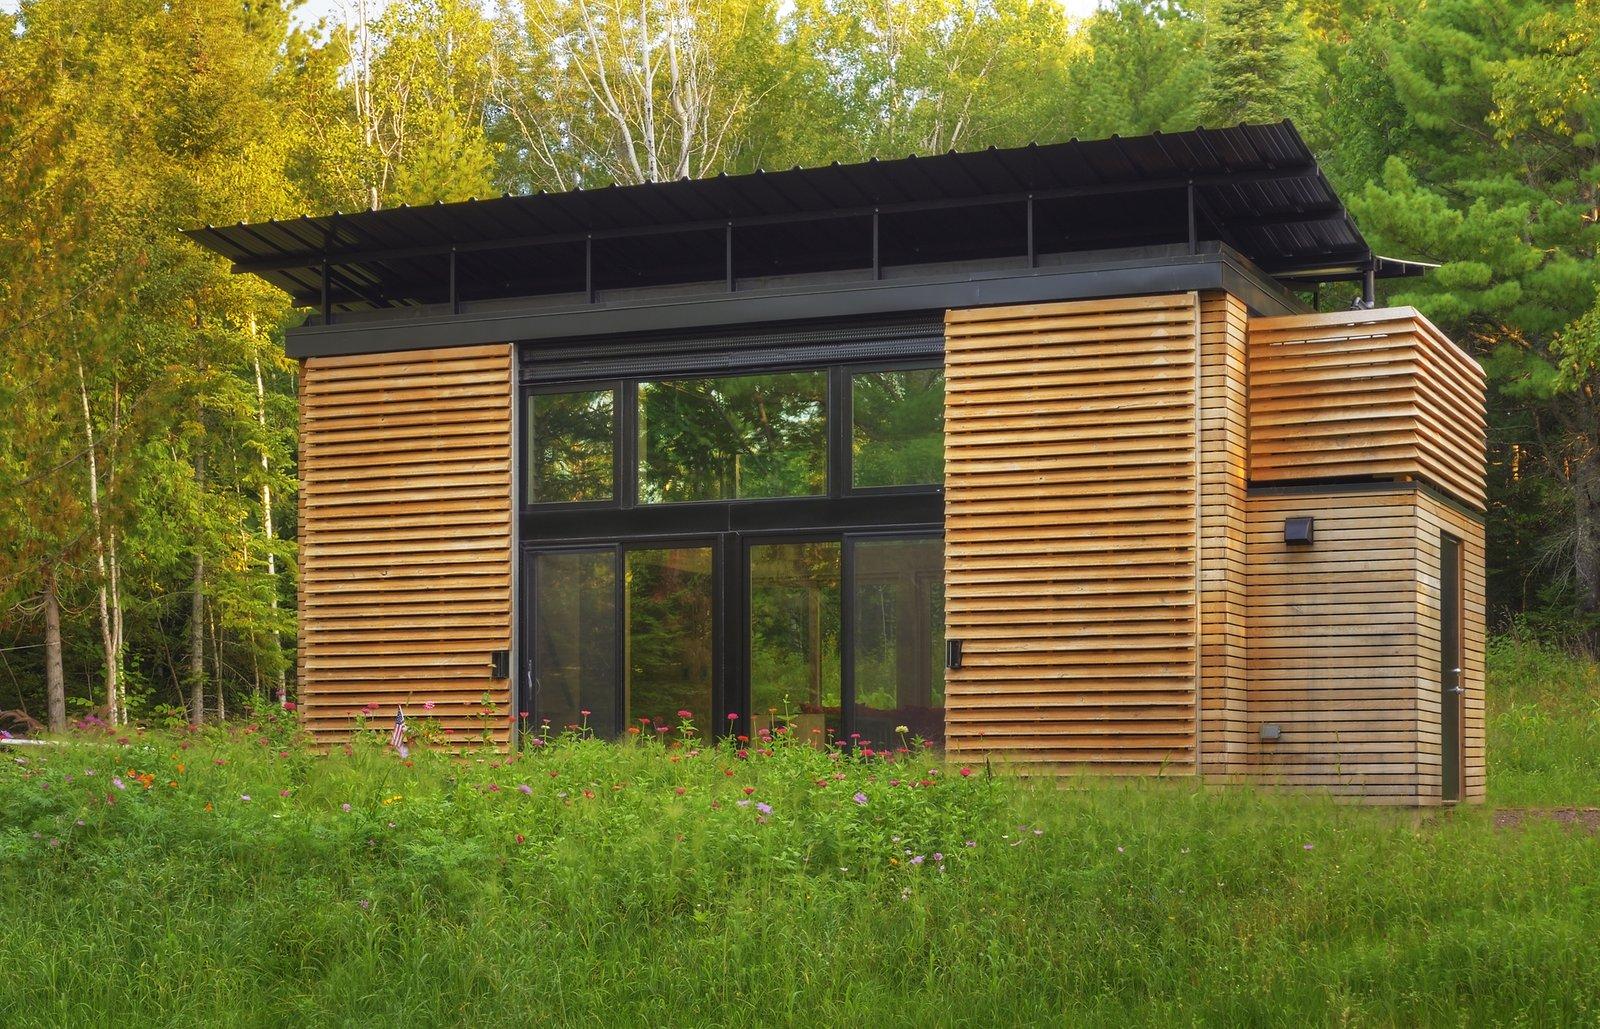 E.D.G.E. House Revelations Architects exterior